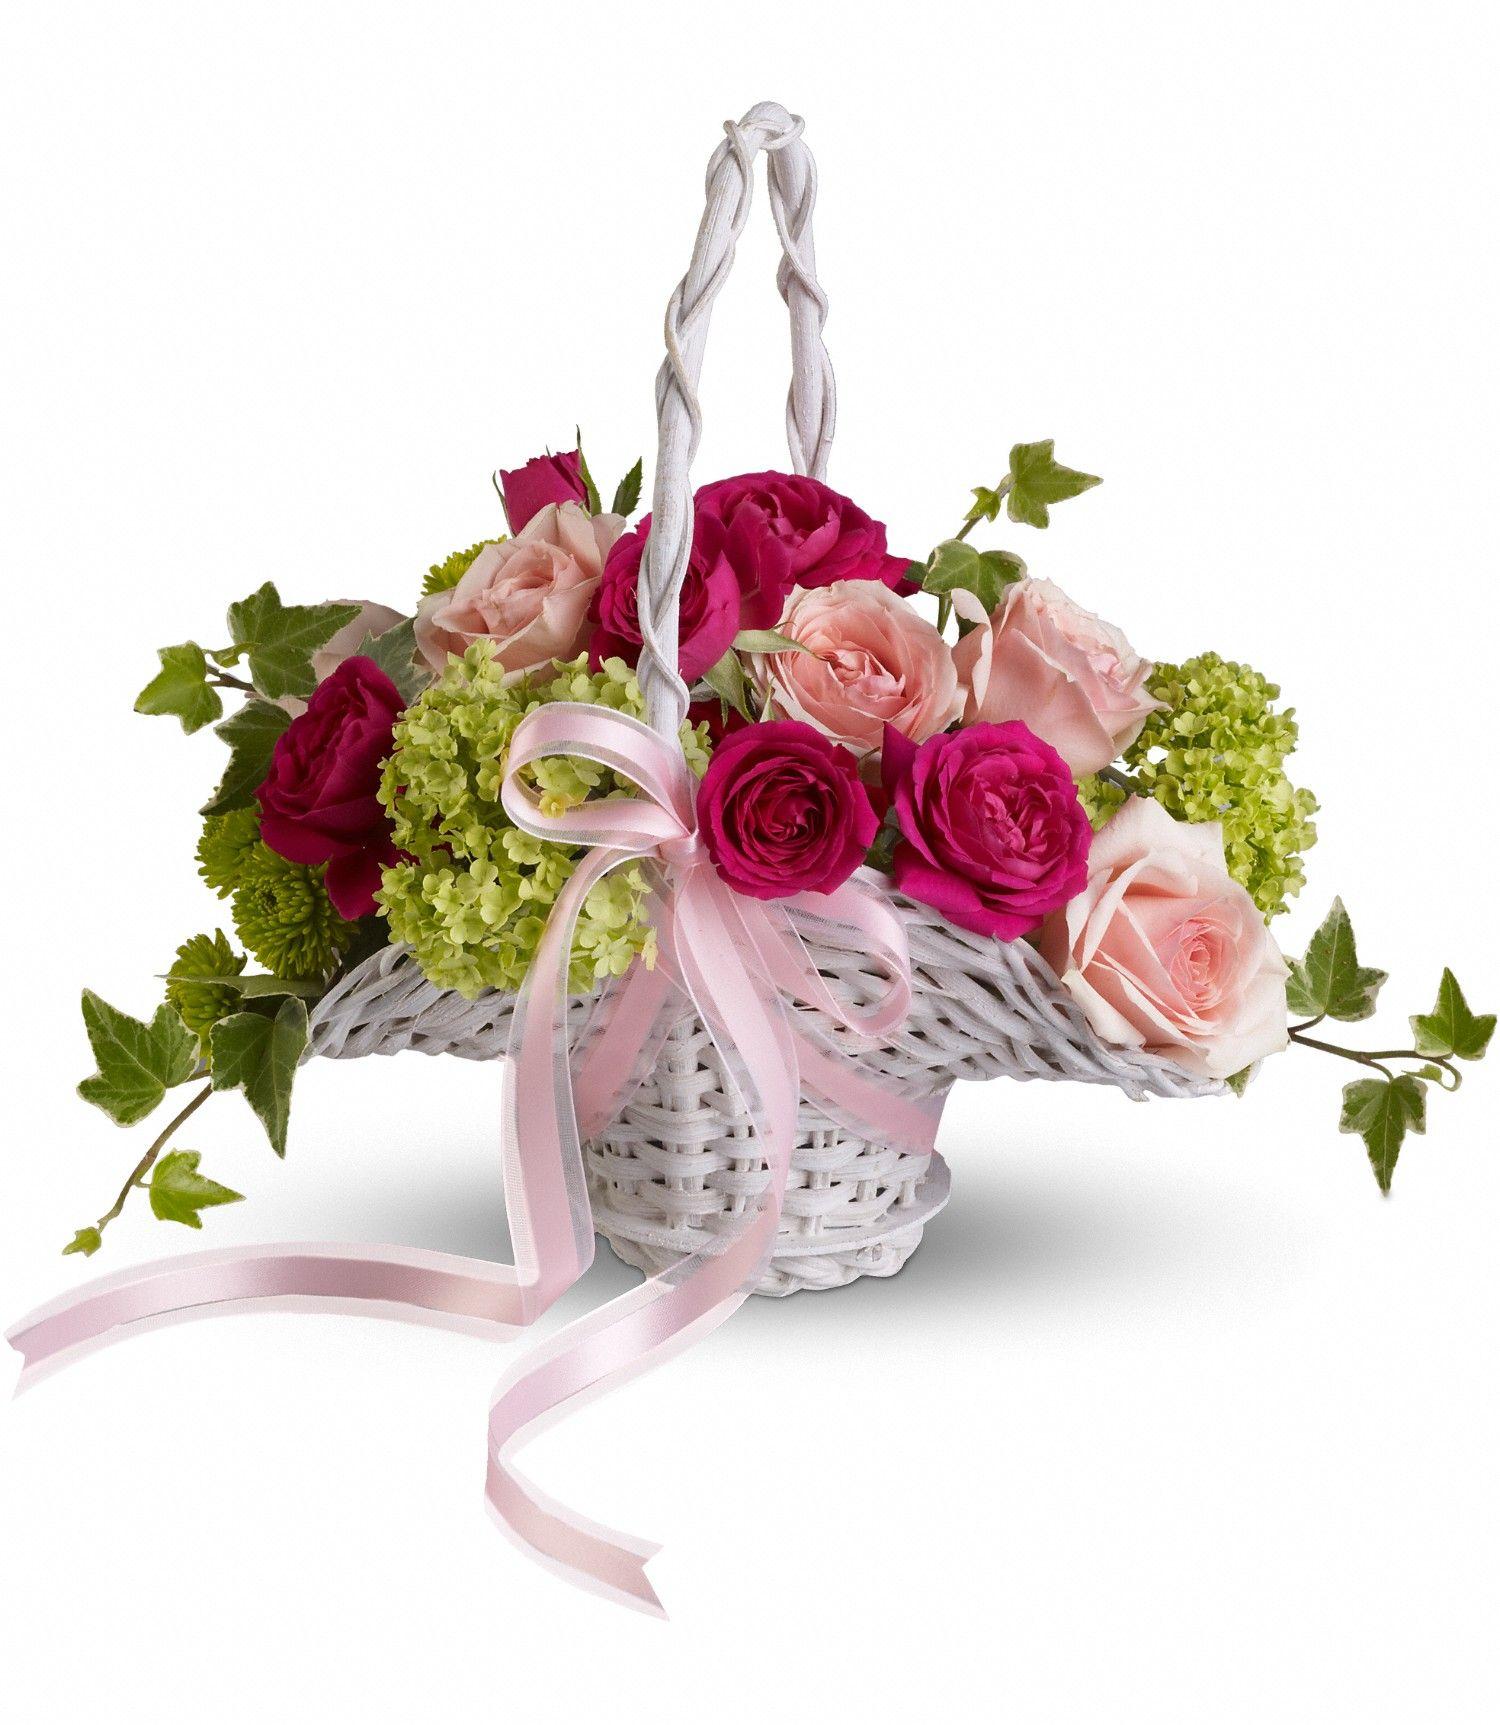 Httpmedfordfloralgifsimagewedding20flower20basket httpmedfordfloralgifsimagewedding20flower20basketg beautiful flowers pinterest flower basket and beautiful flowers izmirmasajfo